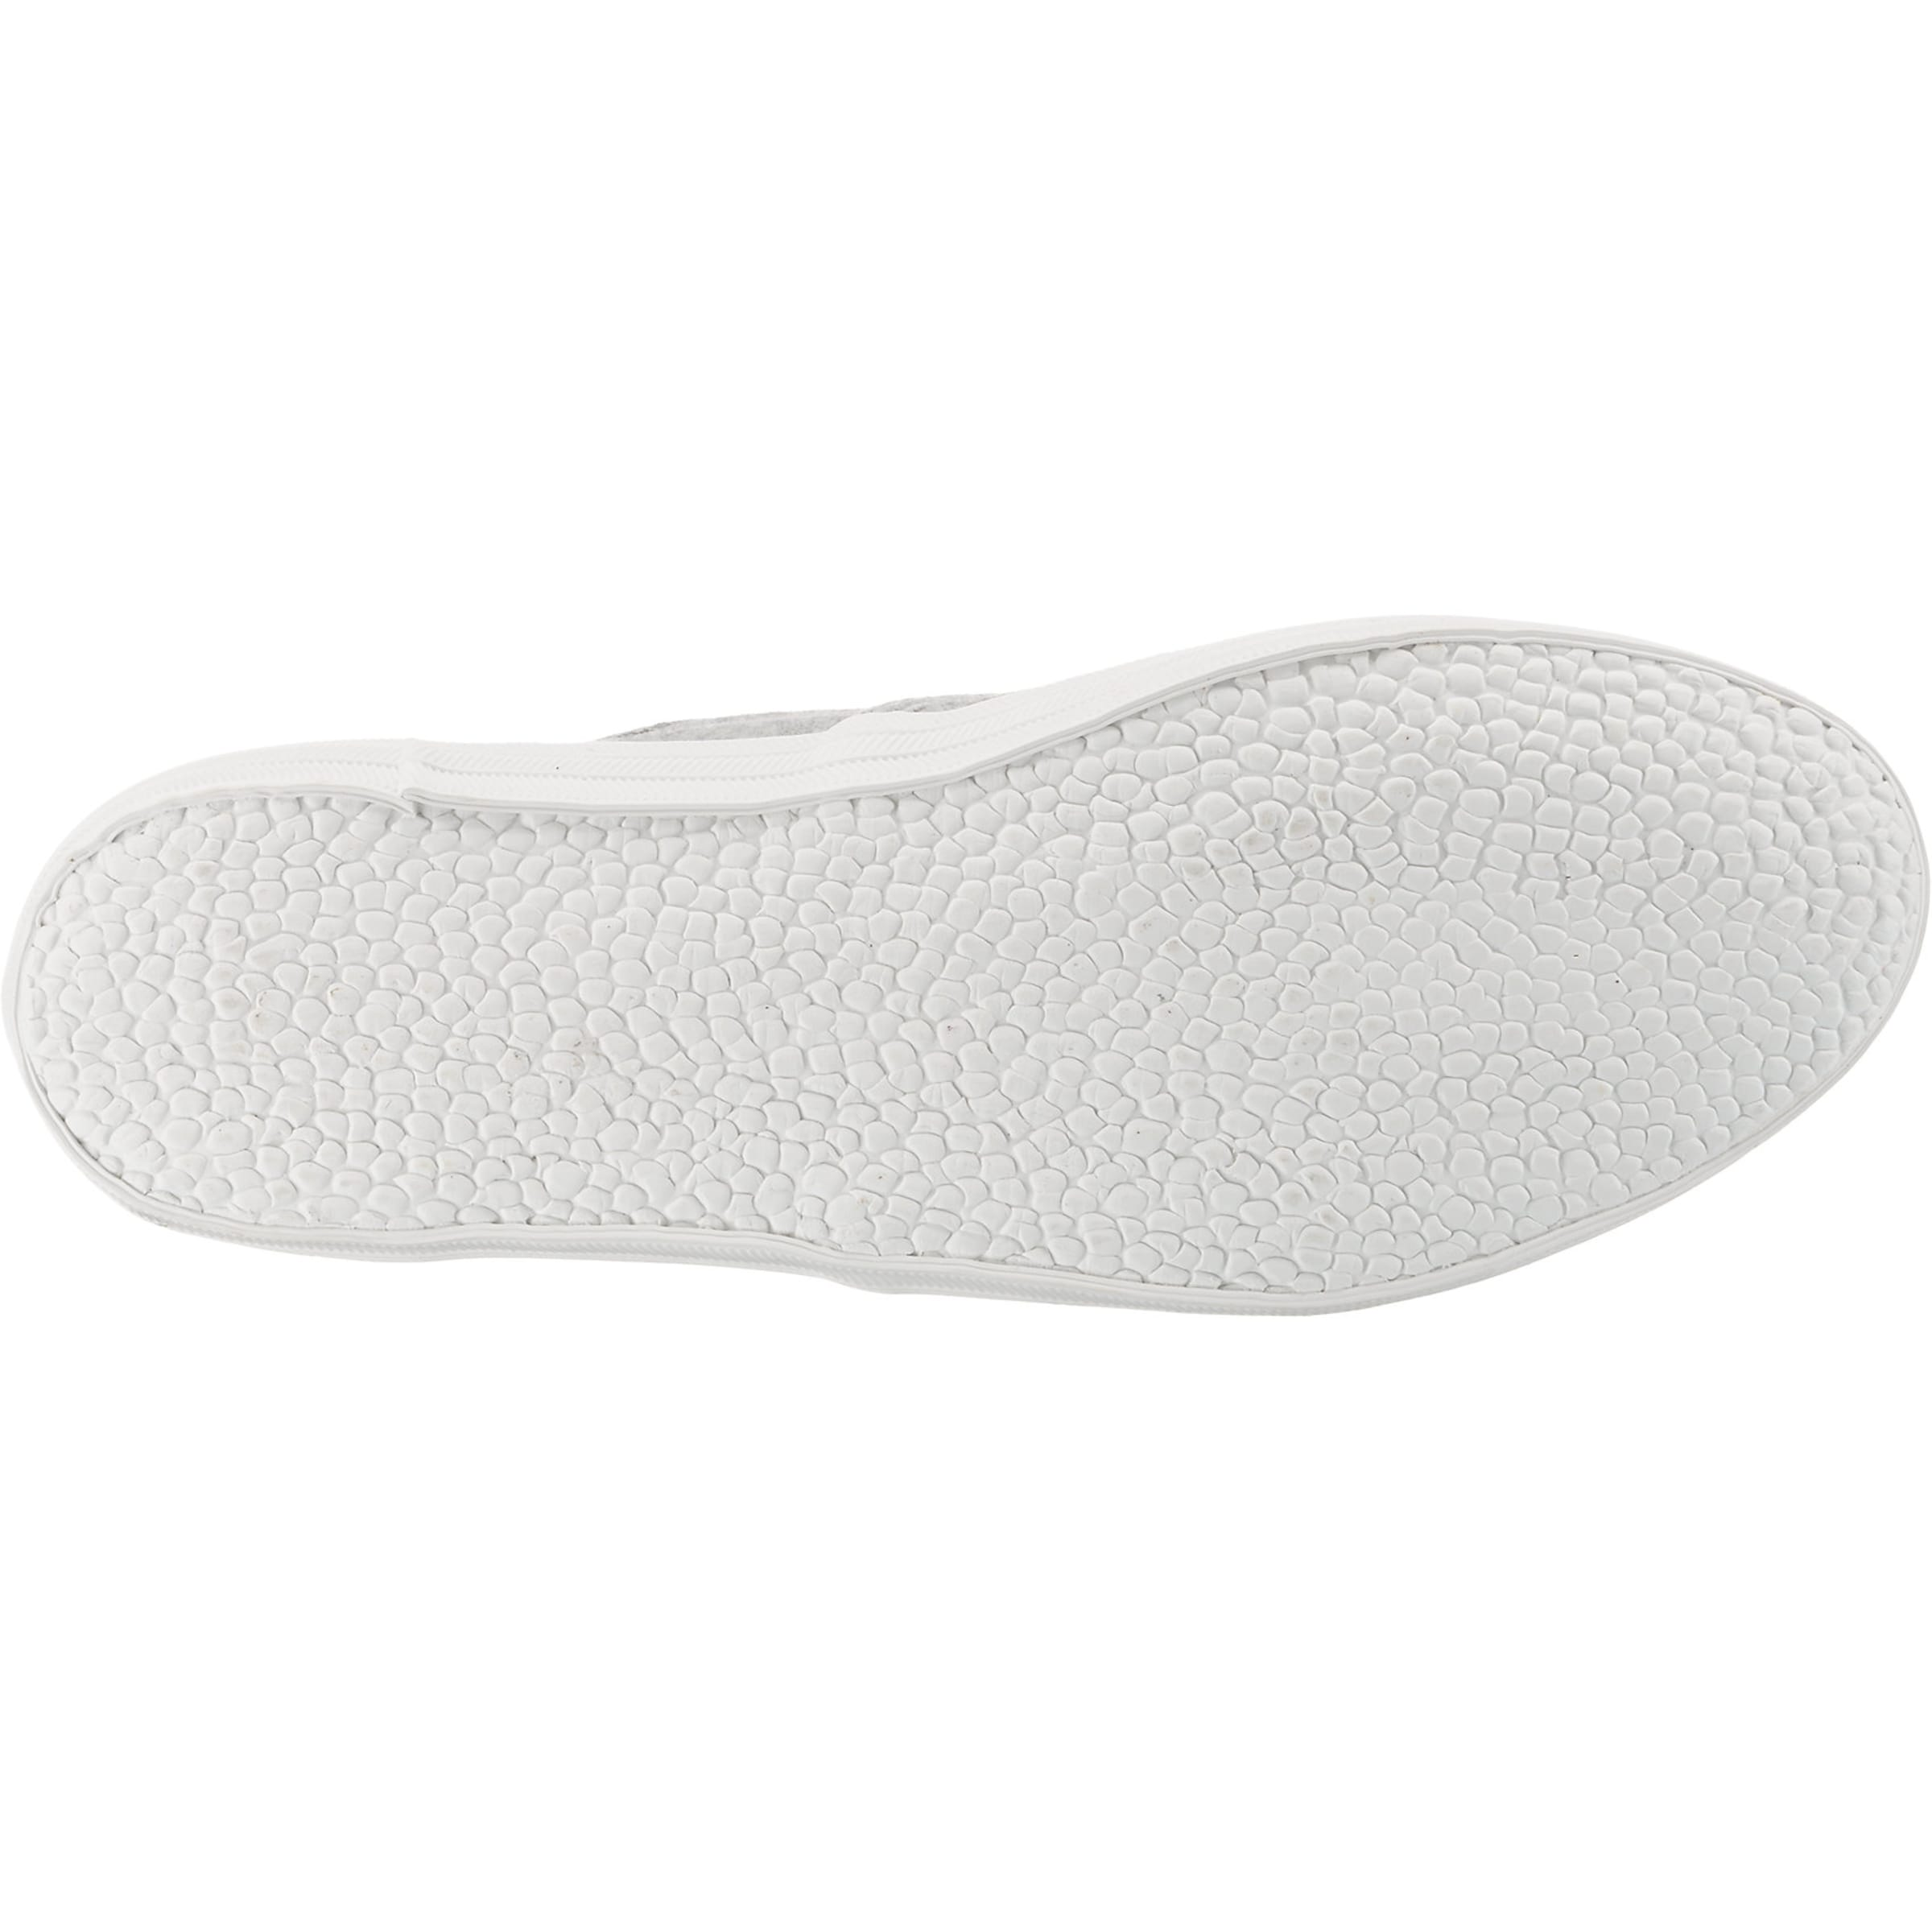 Sneakers In Tailor Tom GrauWeiß NwX8PkZ0nO